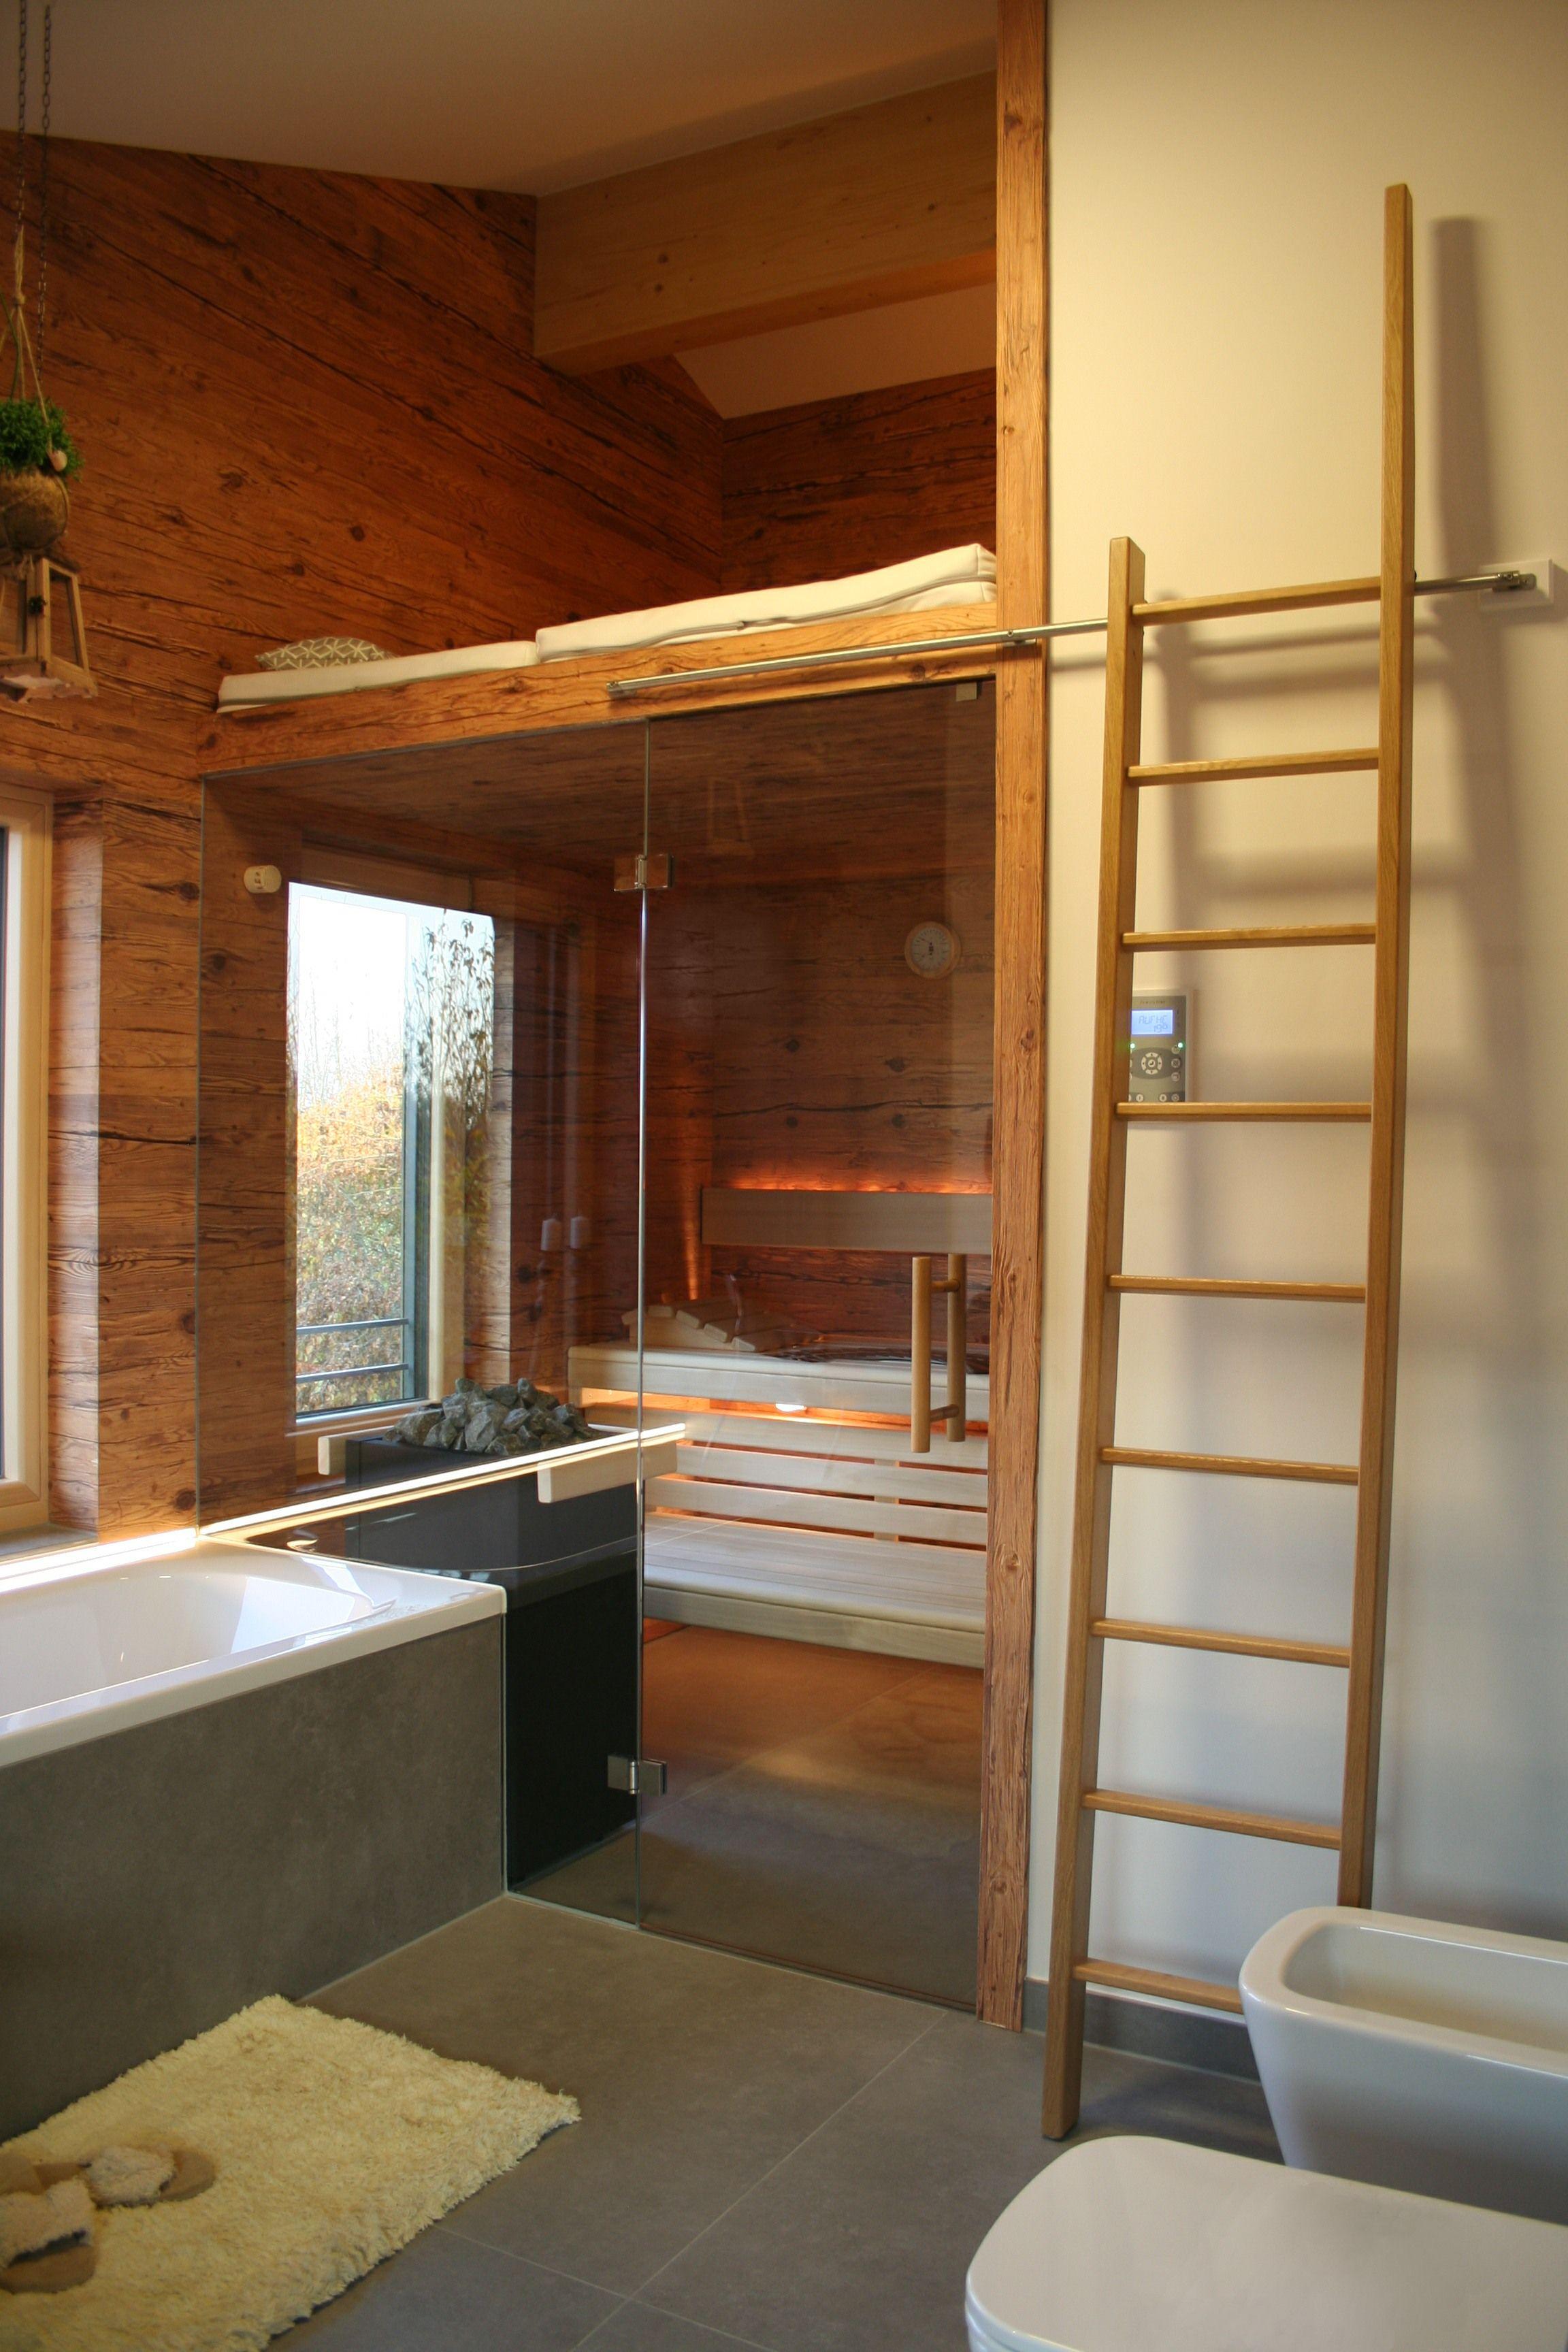 Sauna Mit Altholz Altholz Sauna Badezimmer Mit Sauna Gartenhaus Mit Sauna